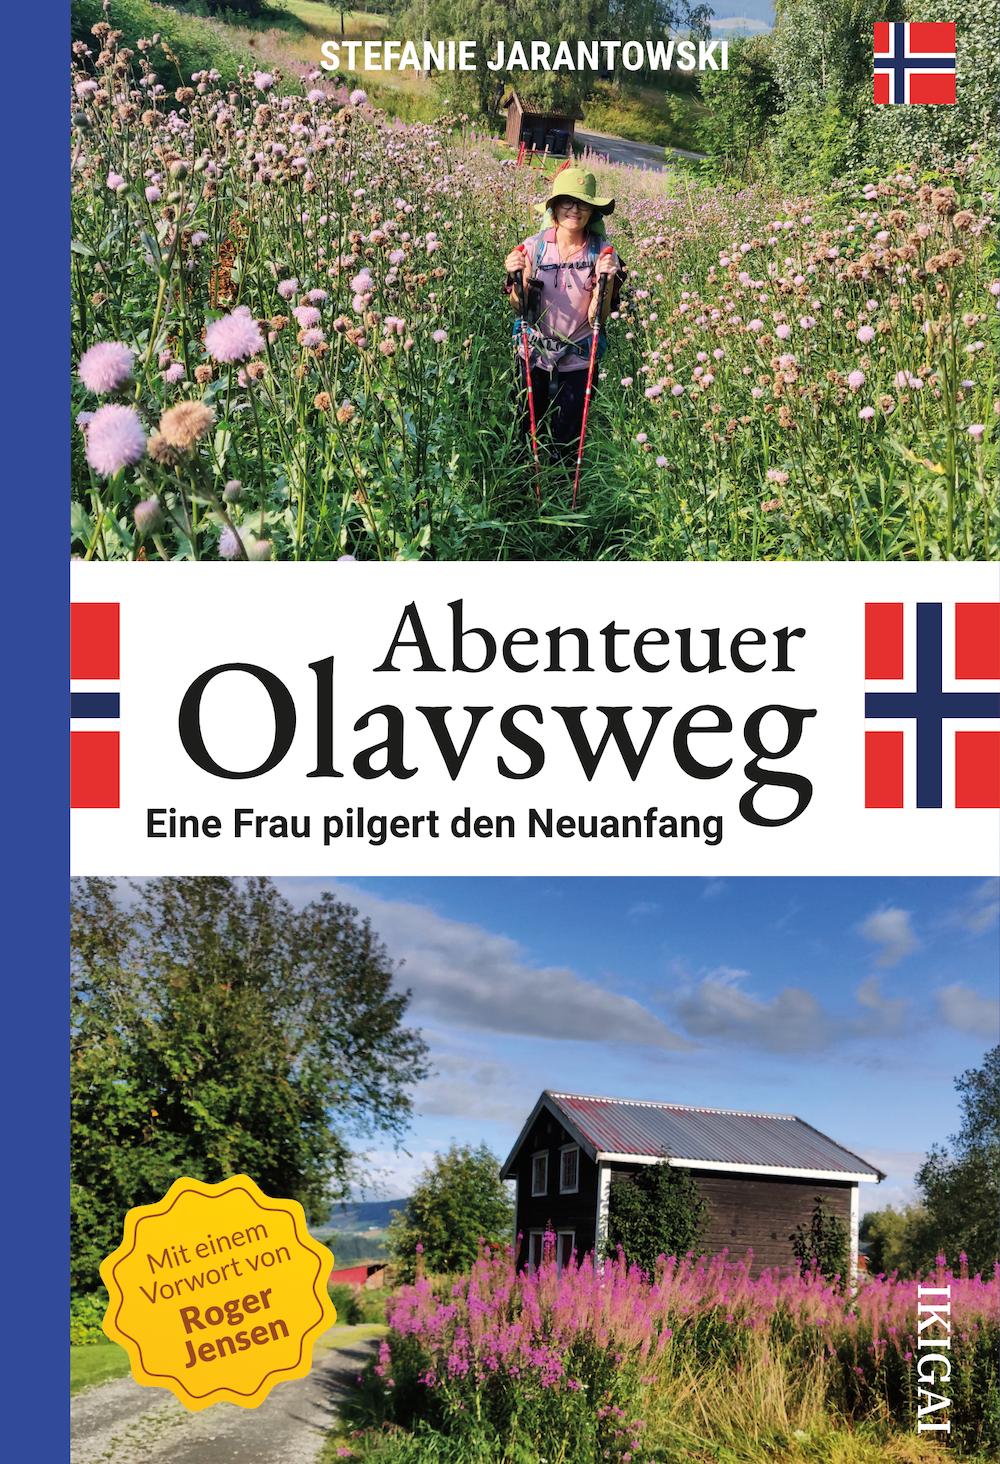 Abenteuer Olavsweg